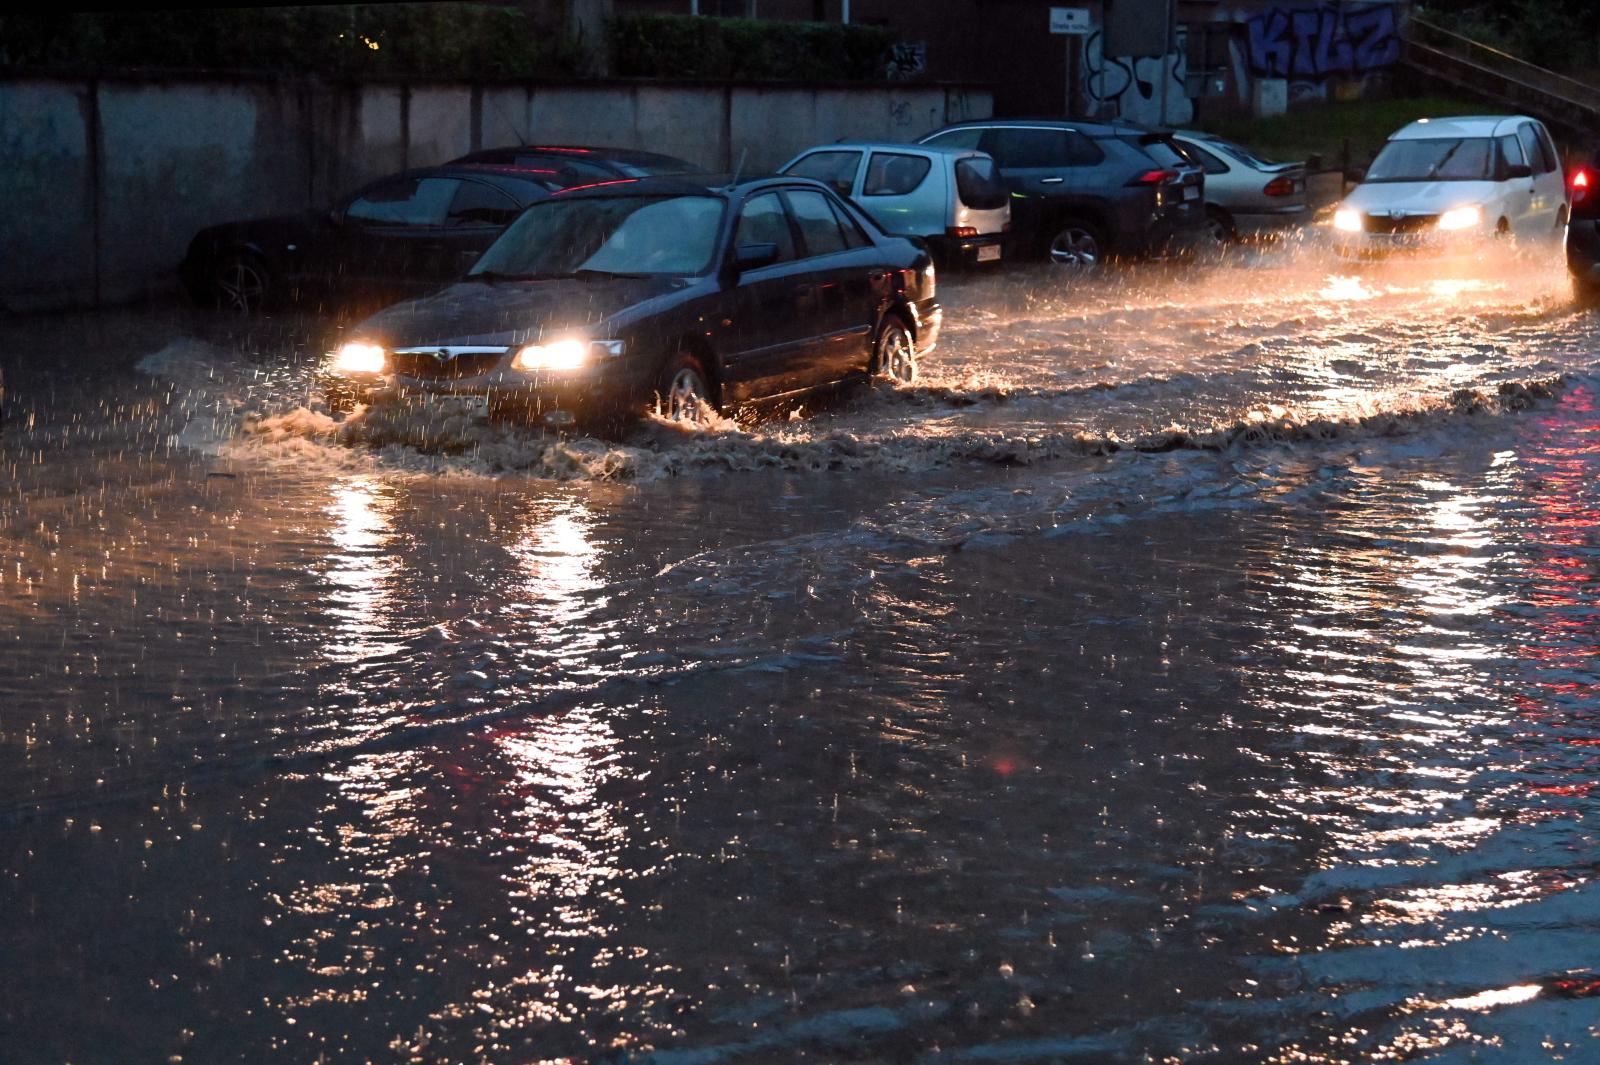 The city of Szczecin saw flash flooding on Friday evening.